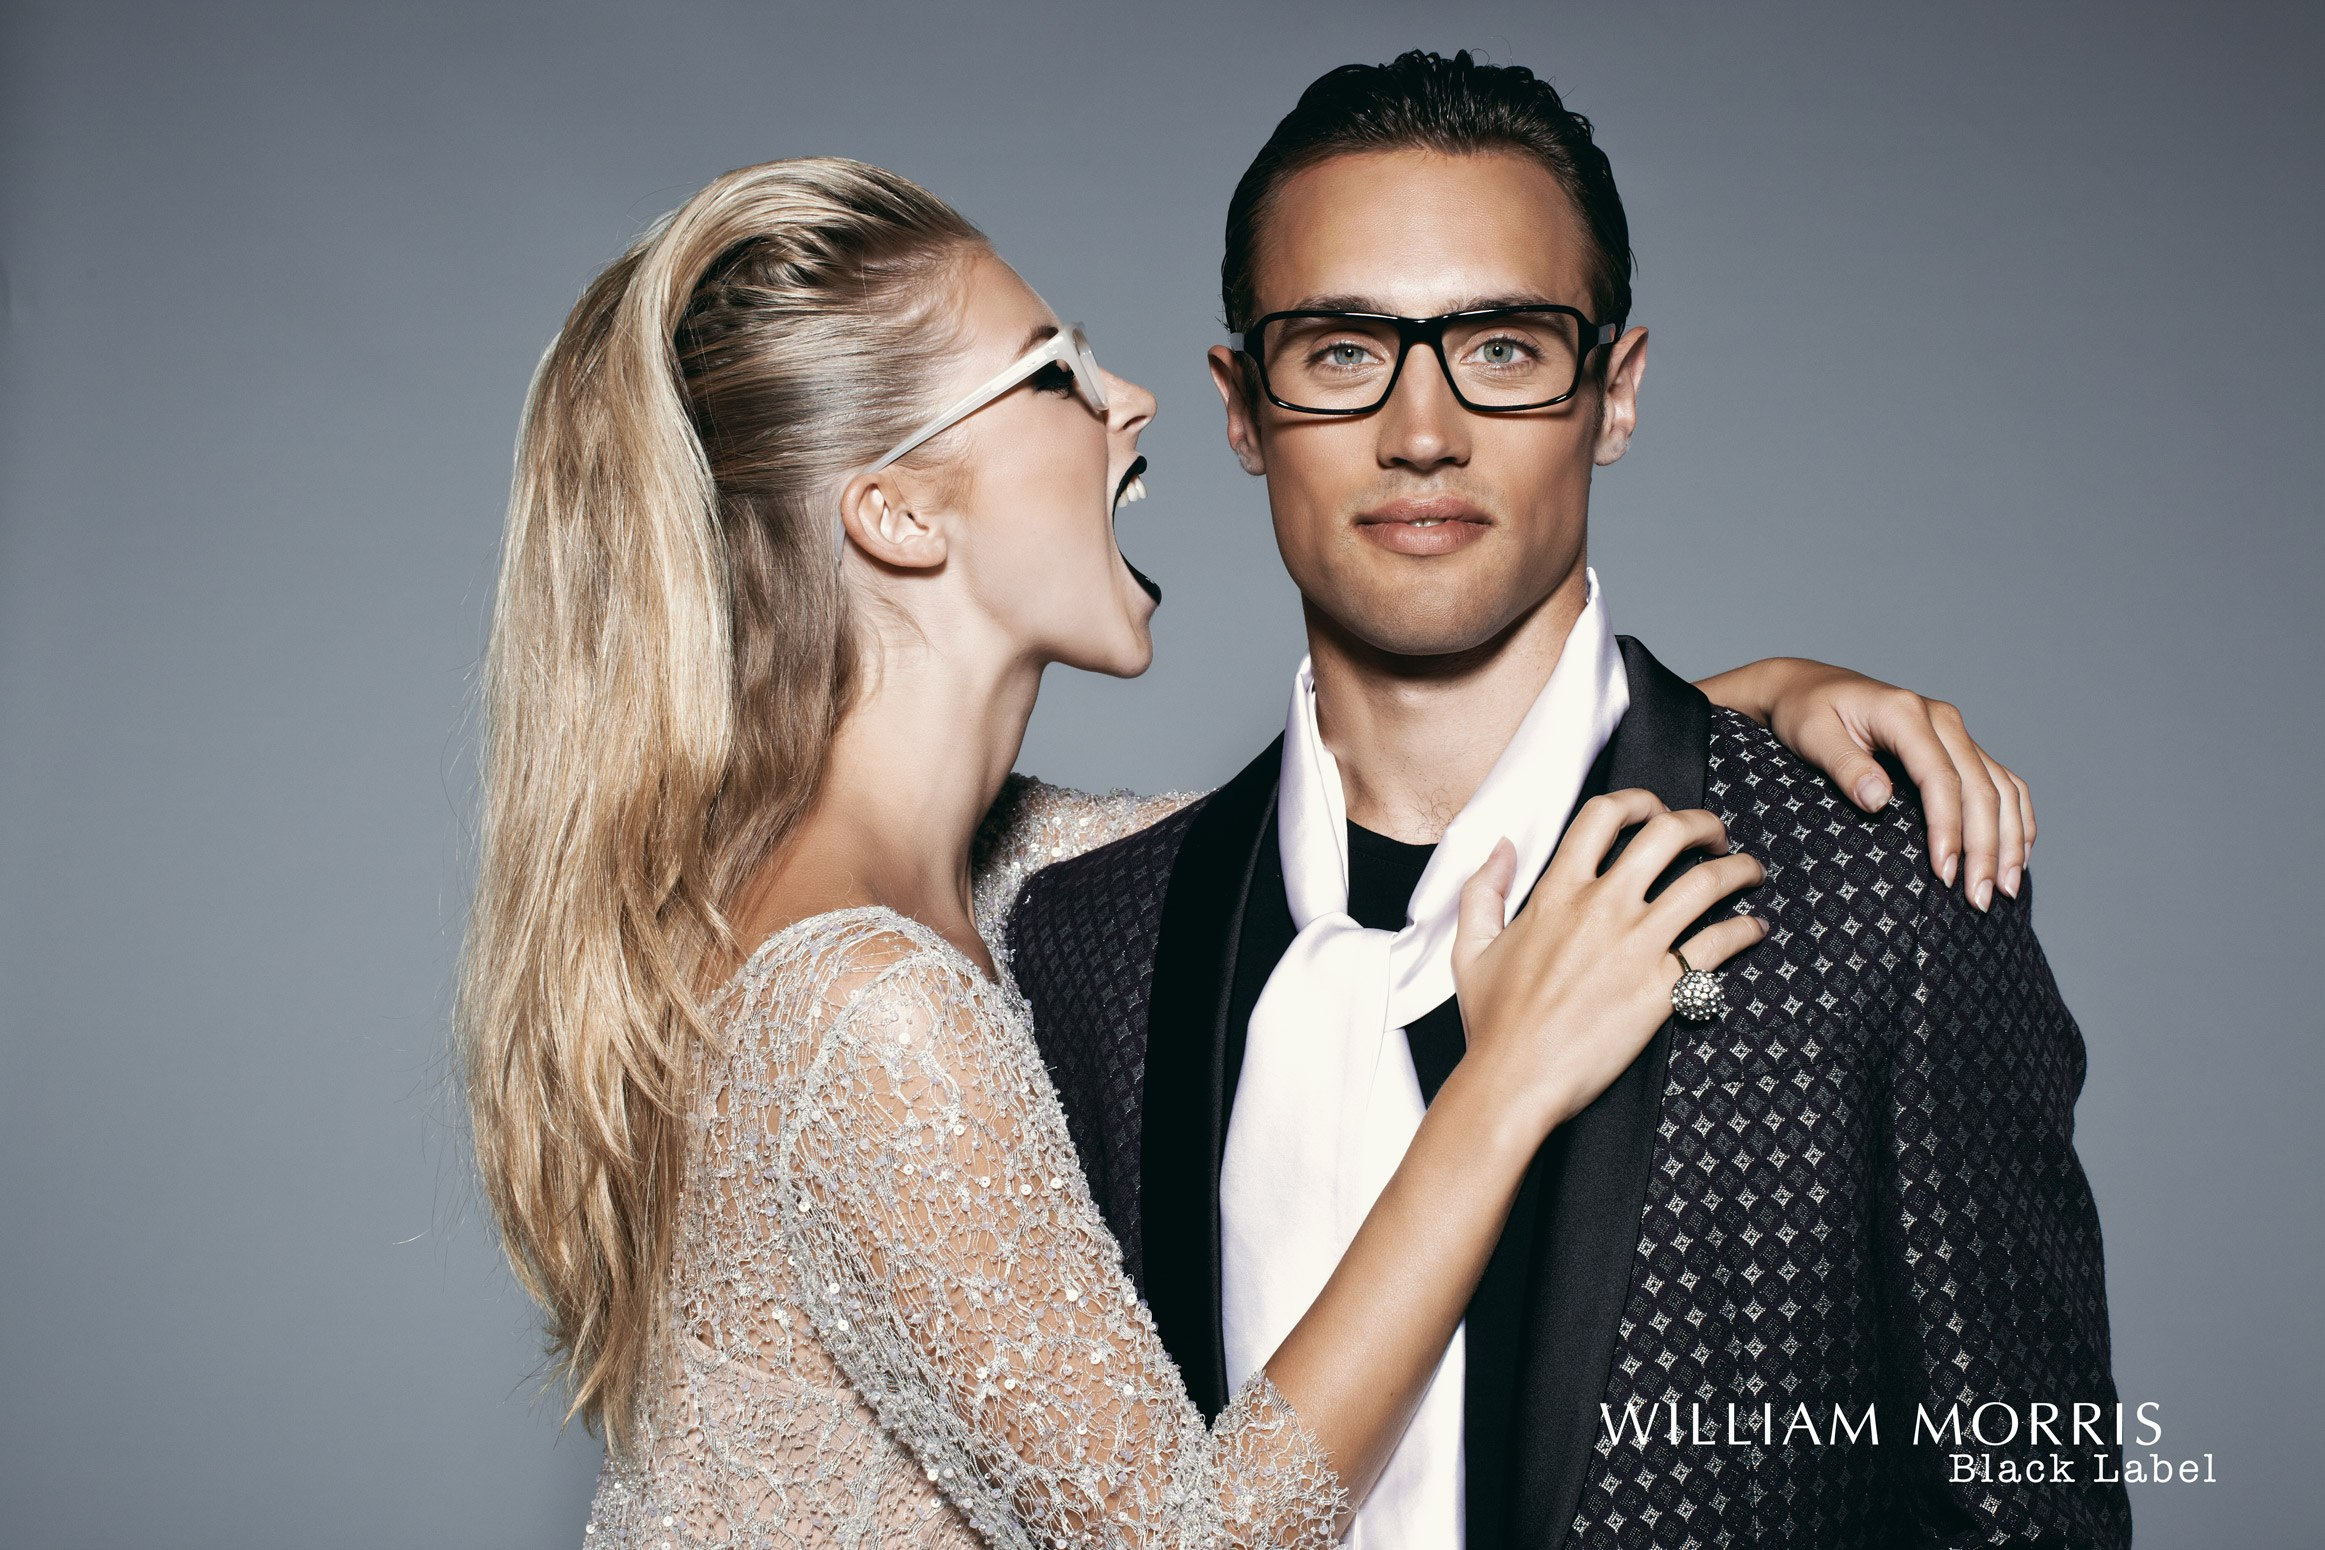 william-morris-ruth-rose-fashion-glasses-accessories-london-hermione-corfield-london-tourist-notting-hill-chelsea-fashion-boy-girl-colour-house-6hbx